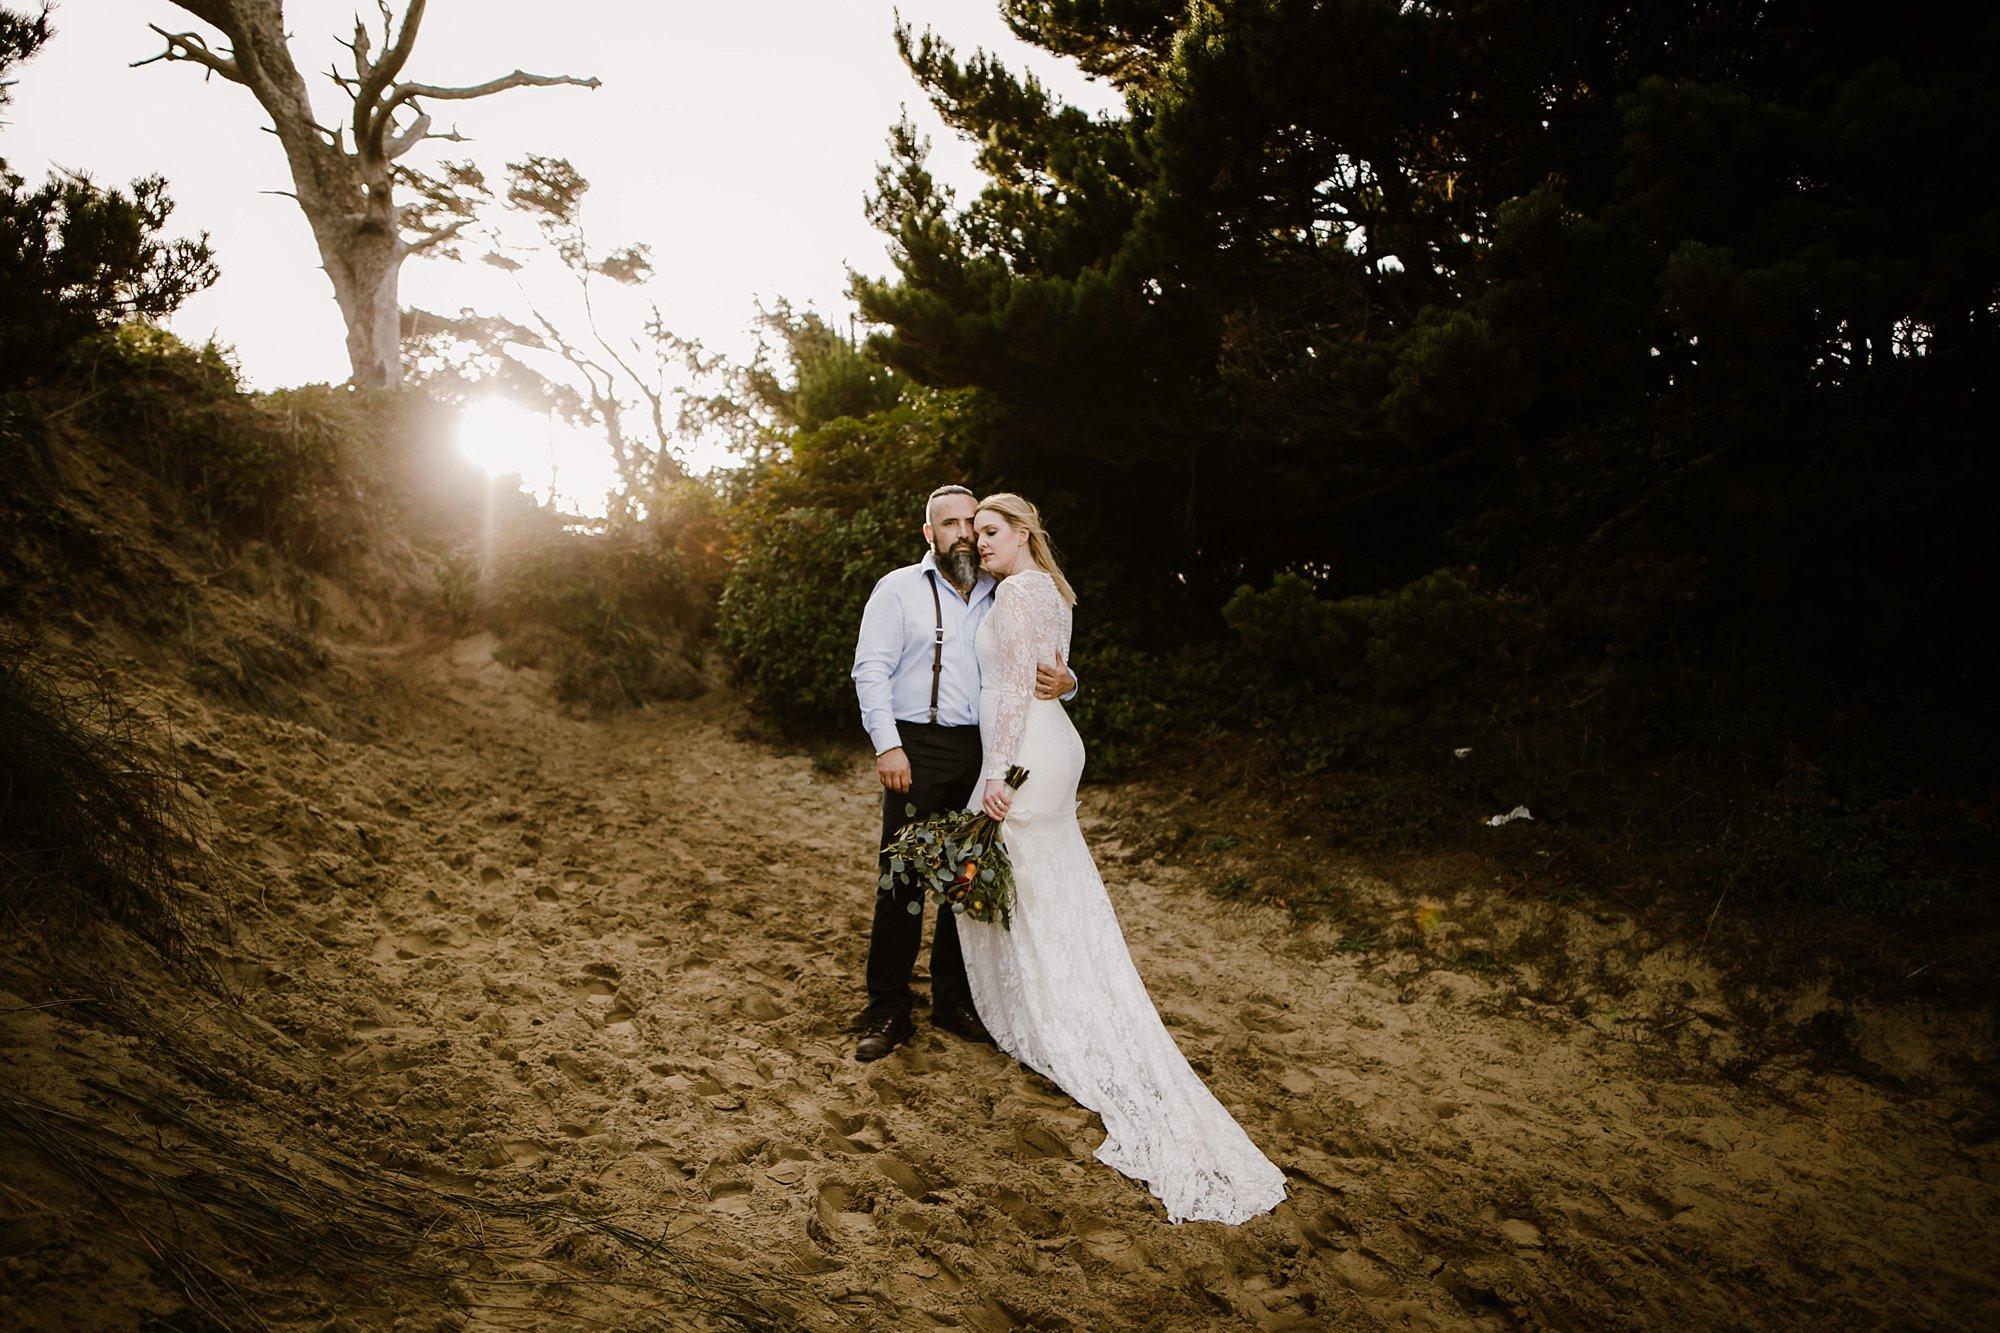 Beach sunset wedding photo by photographer Catalina Jean